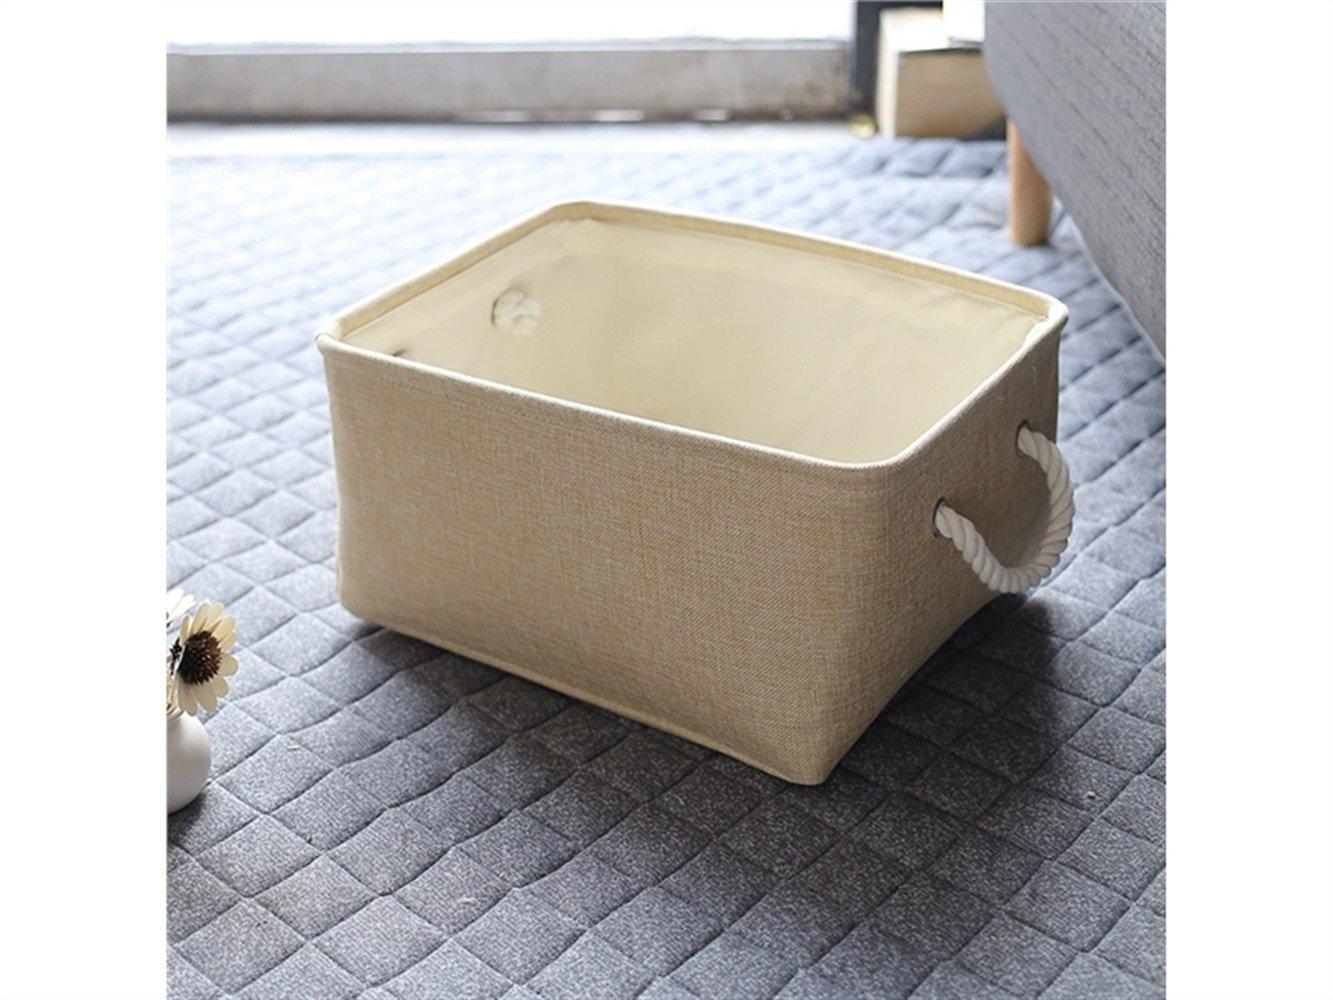 Gelaiken Lightweight Square Hand Storage Box Cotton and Linen Box Jewelry Stationery Cosmetic Case Sundries Storage Box(Light Brown)